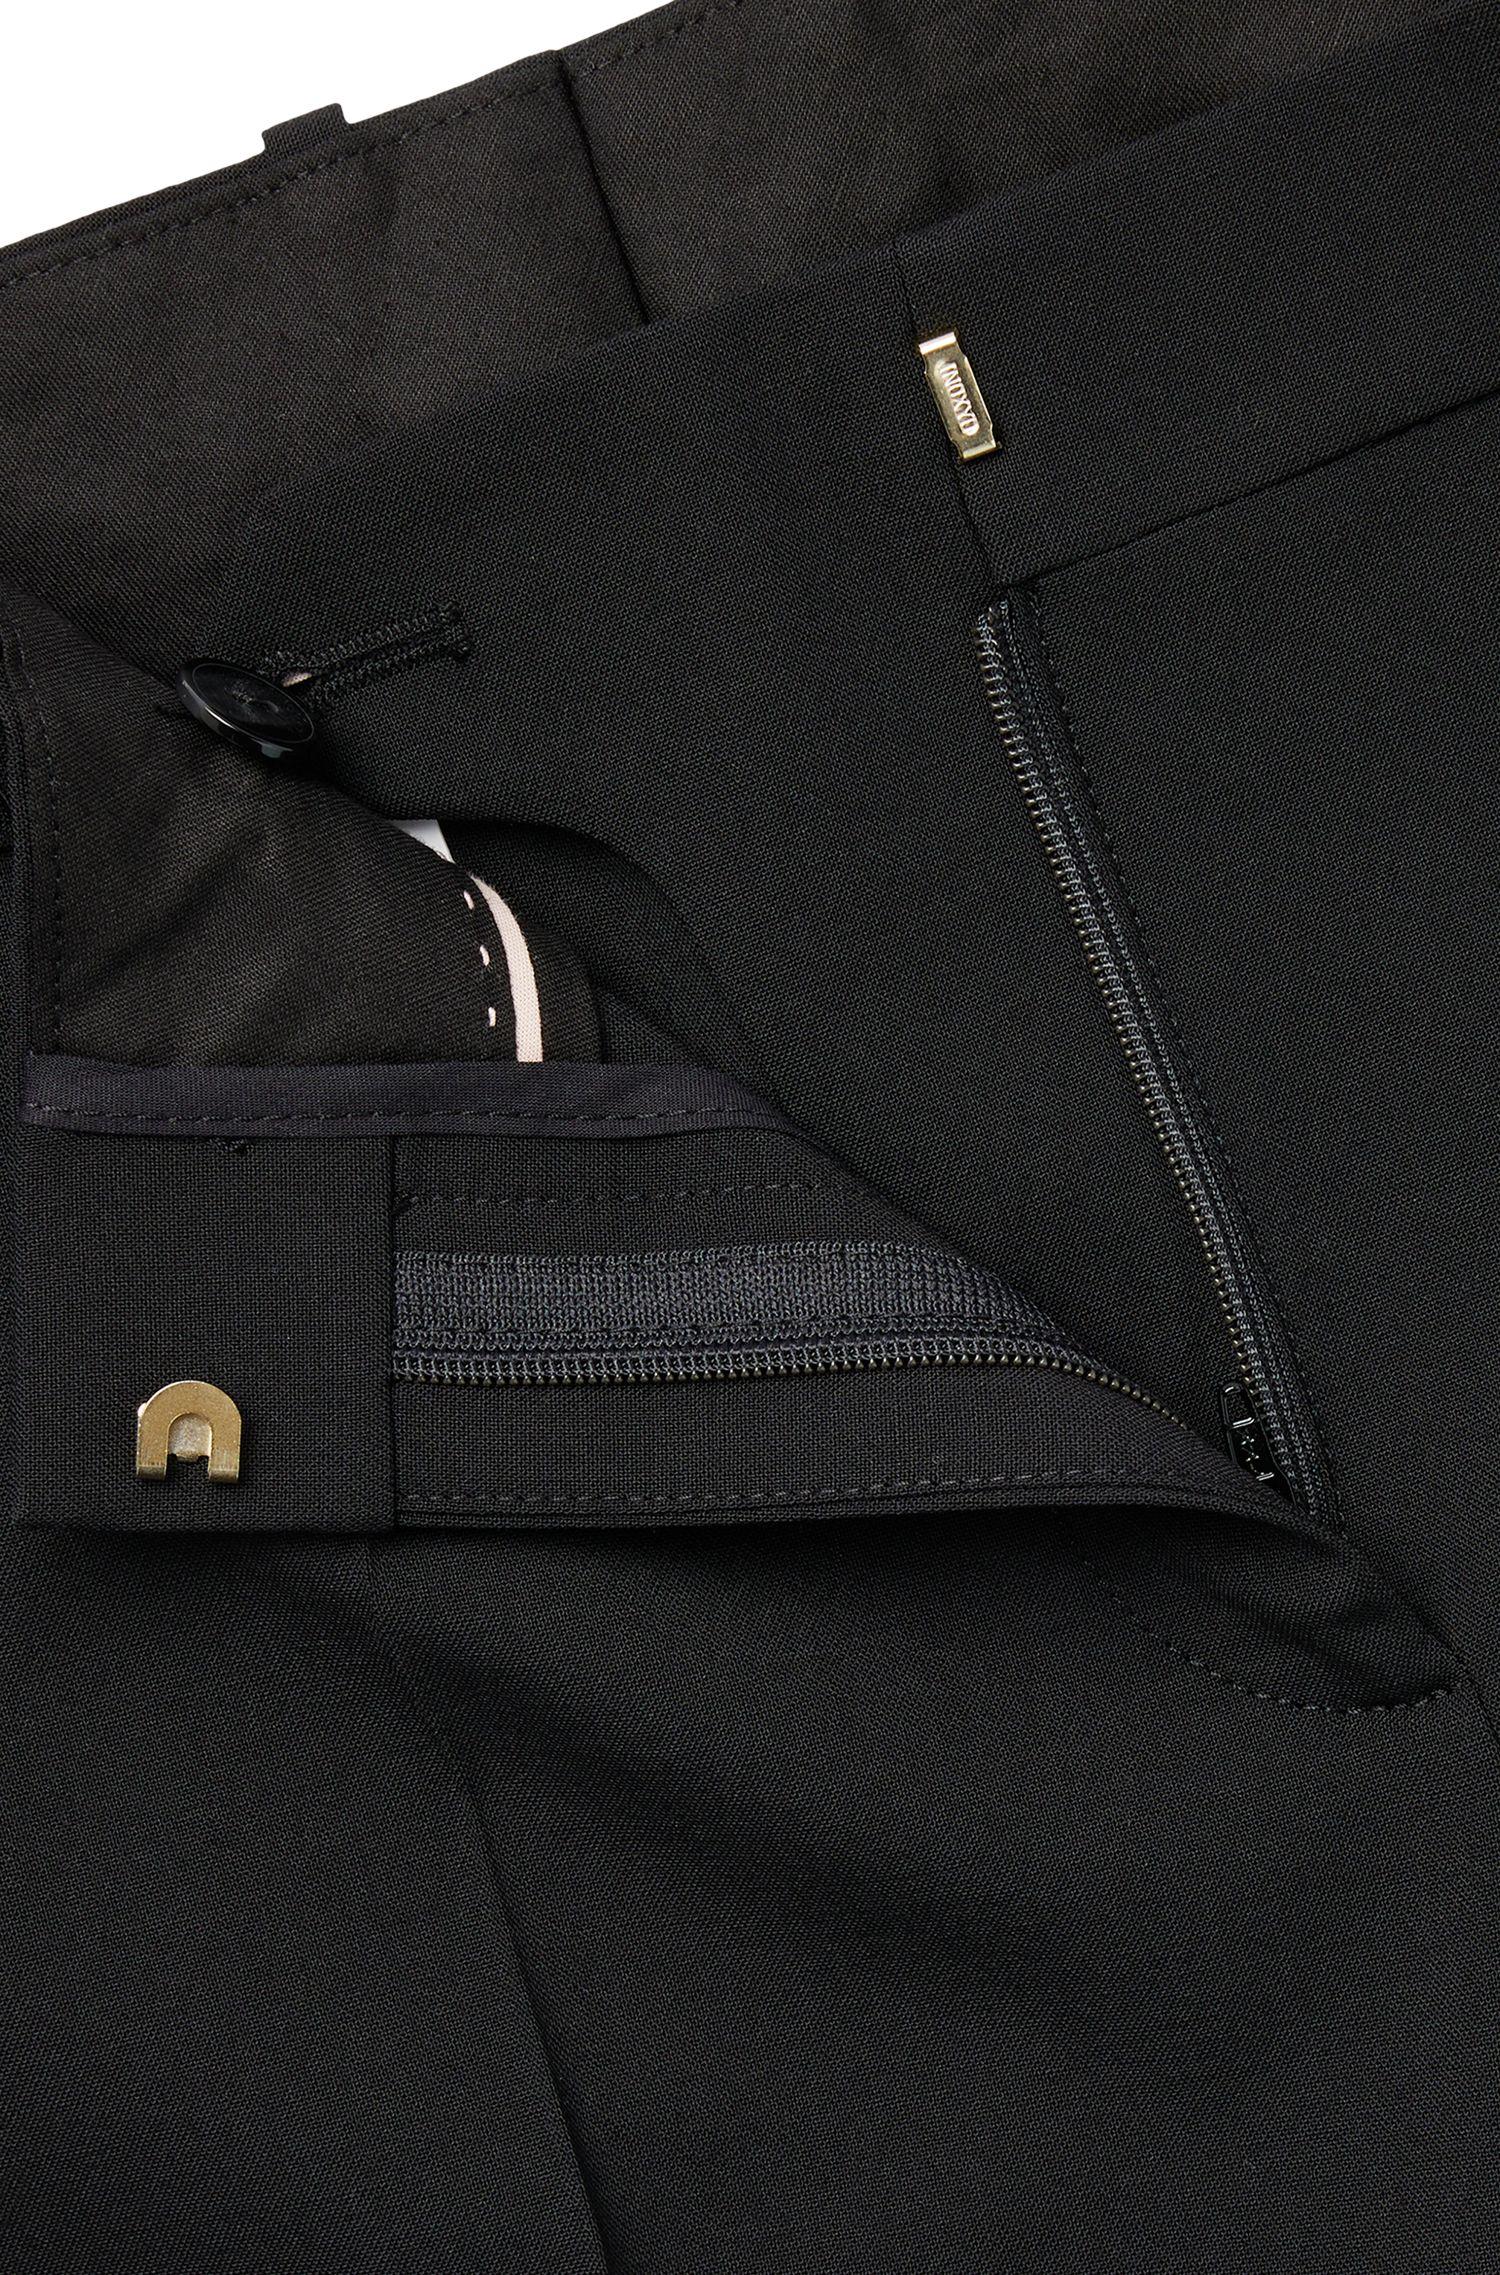 Stretch Virgin Wool Dress Pant | Tiluna, Black